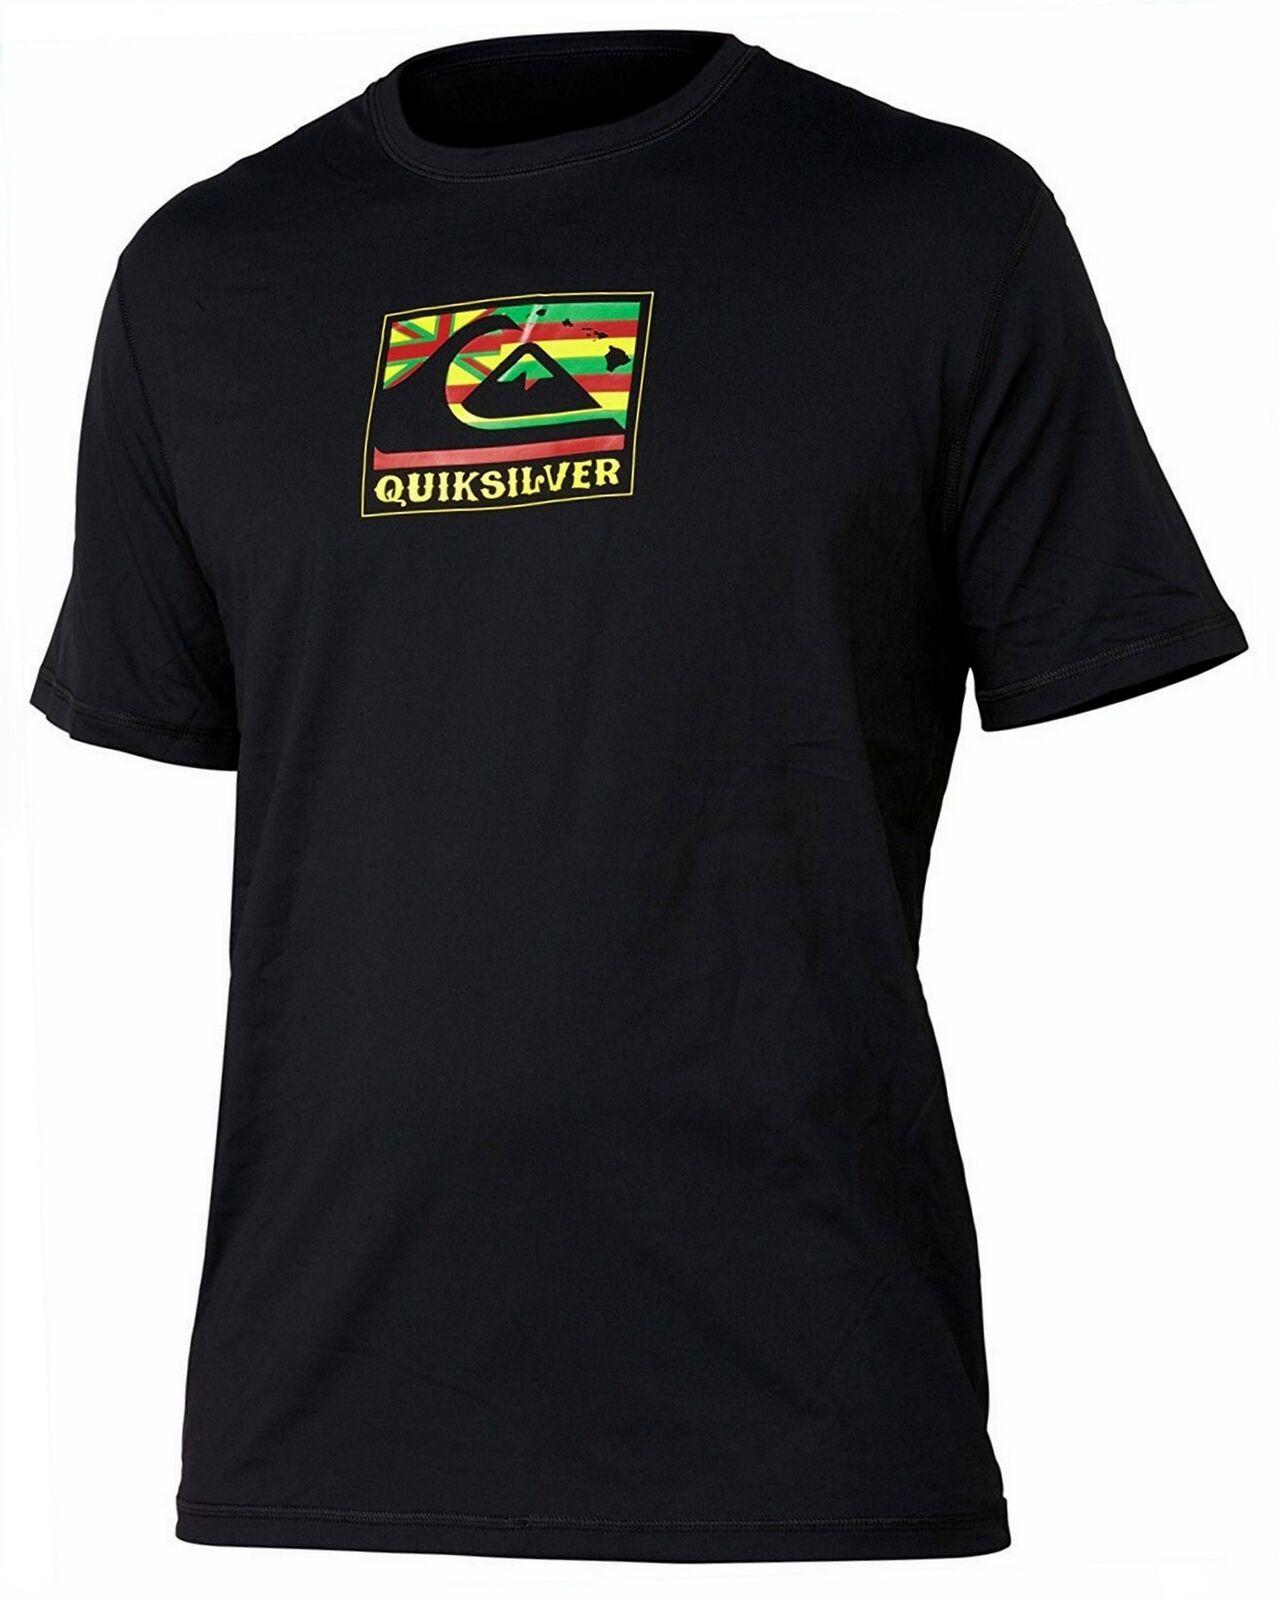 QUIKSILVER Men's Black Pride Rash Guard Short Sleeve Crew Gr